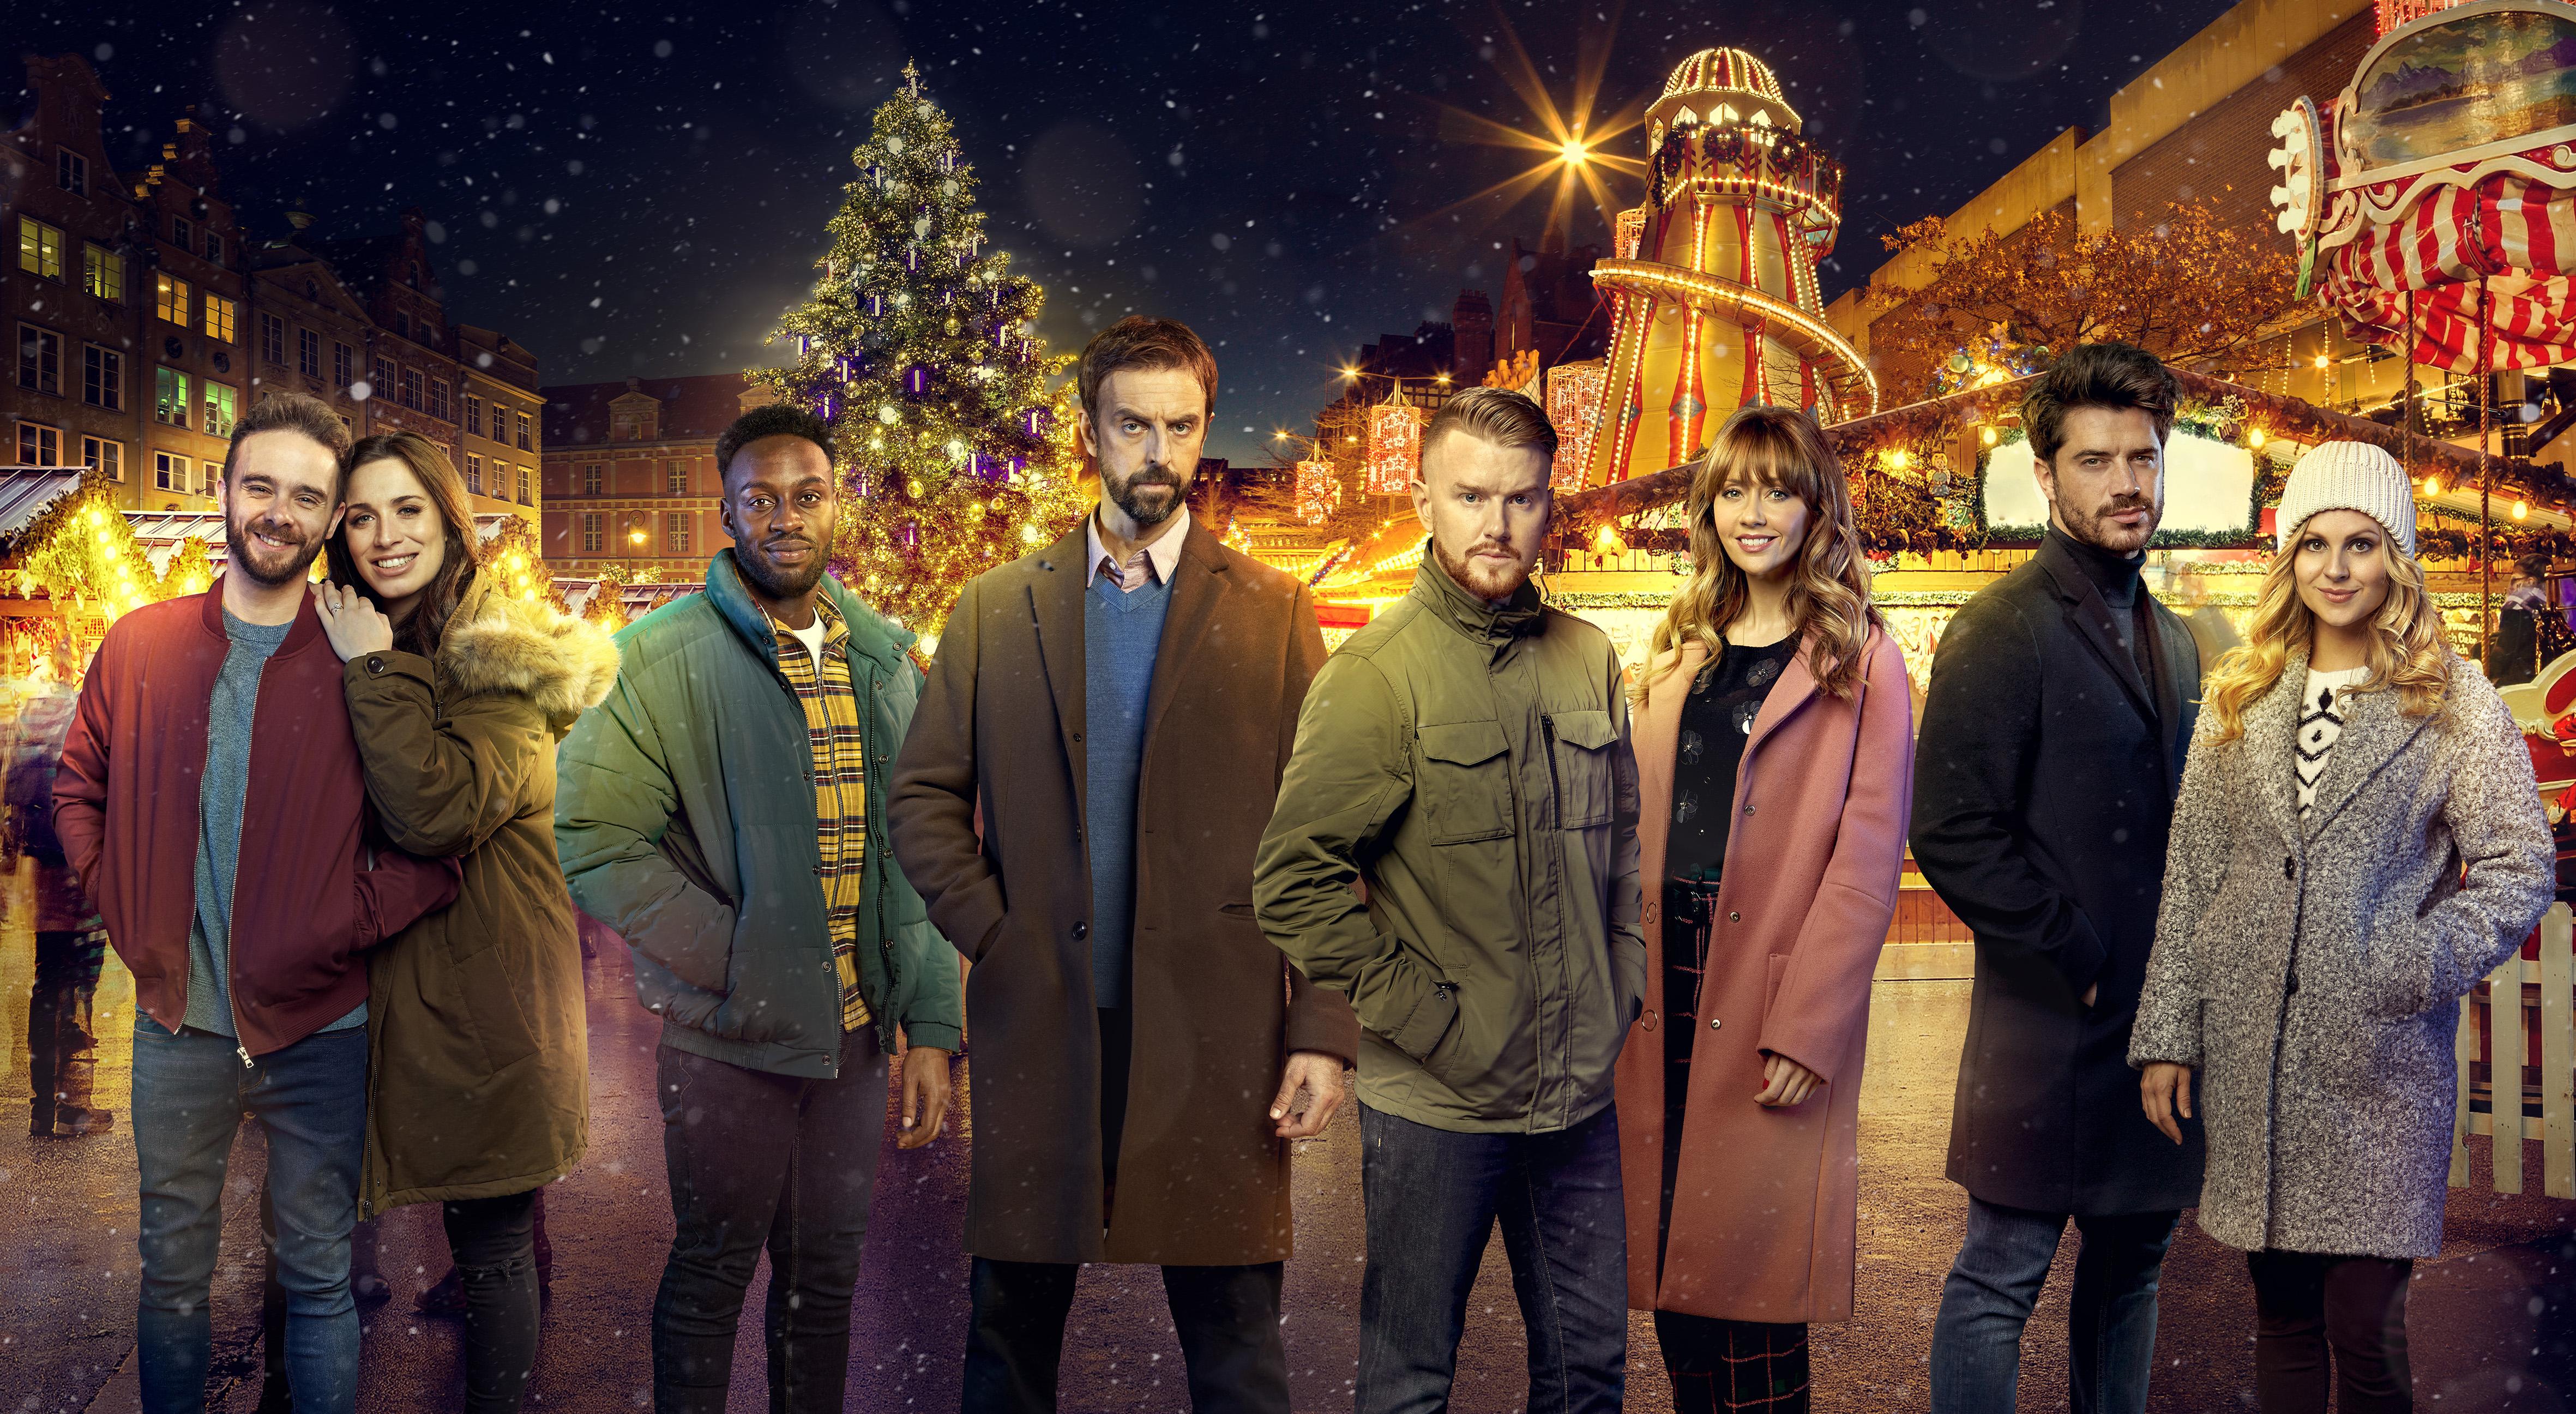 Coronation Street reveals new trailer ahead of Christmas